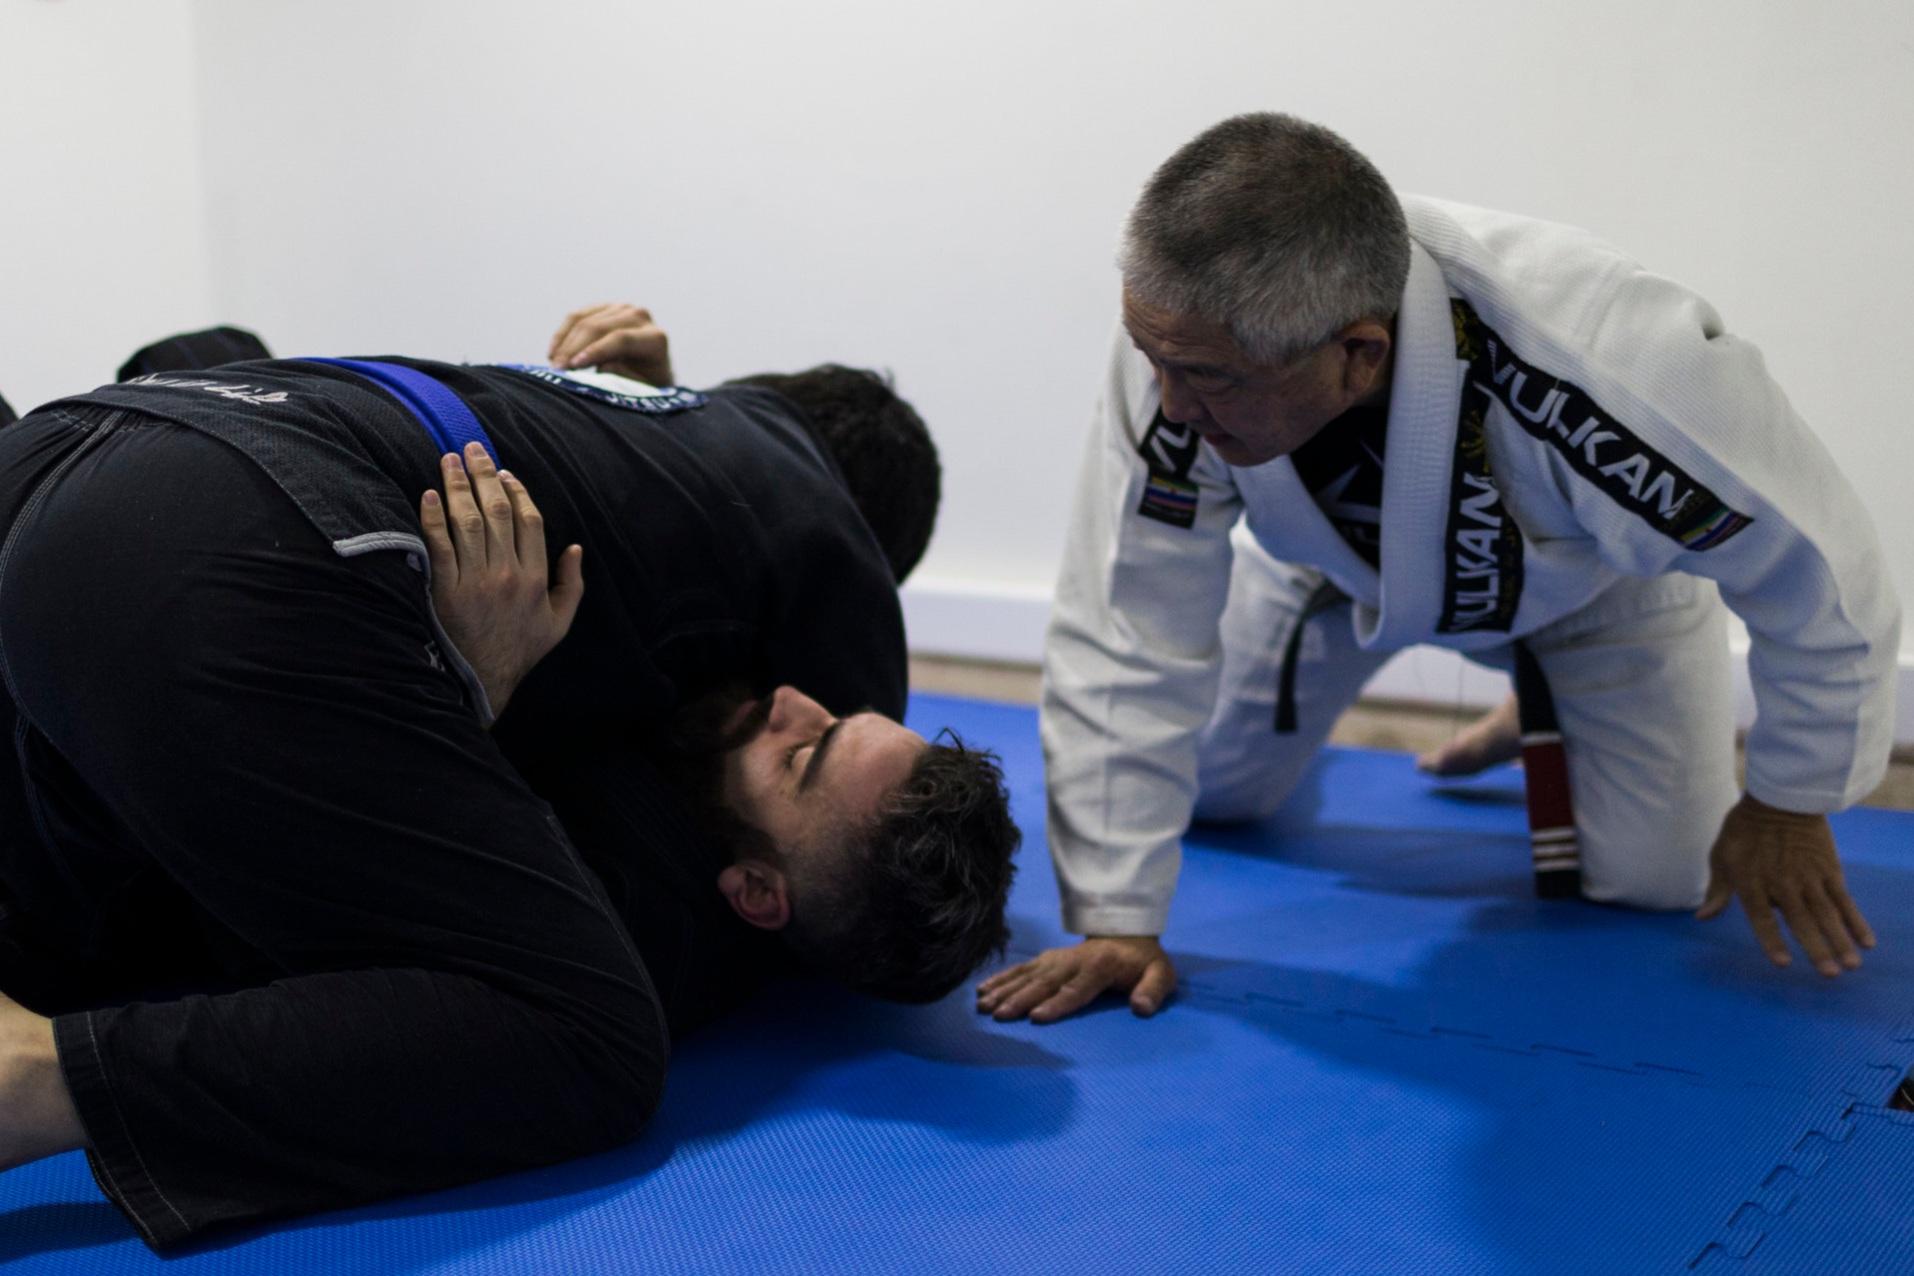 Fundamental jiu jitsu program hemet